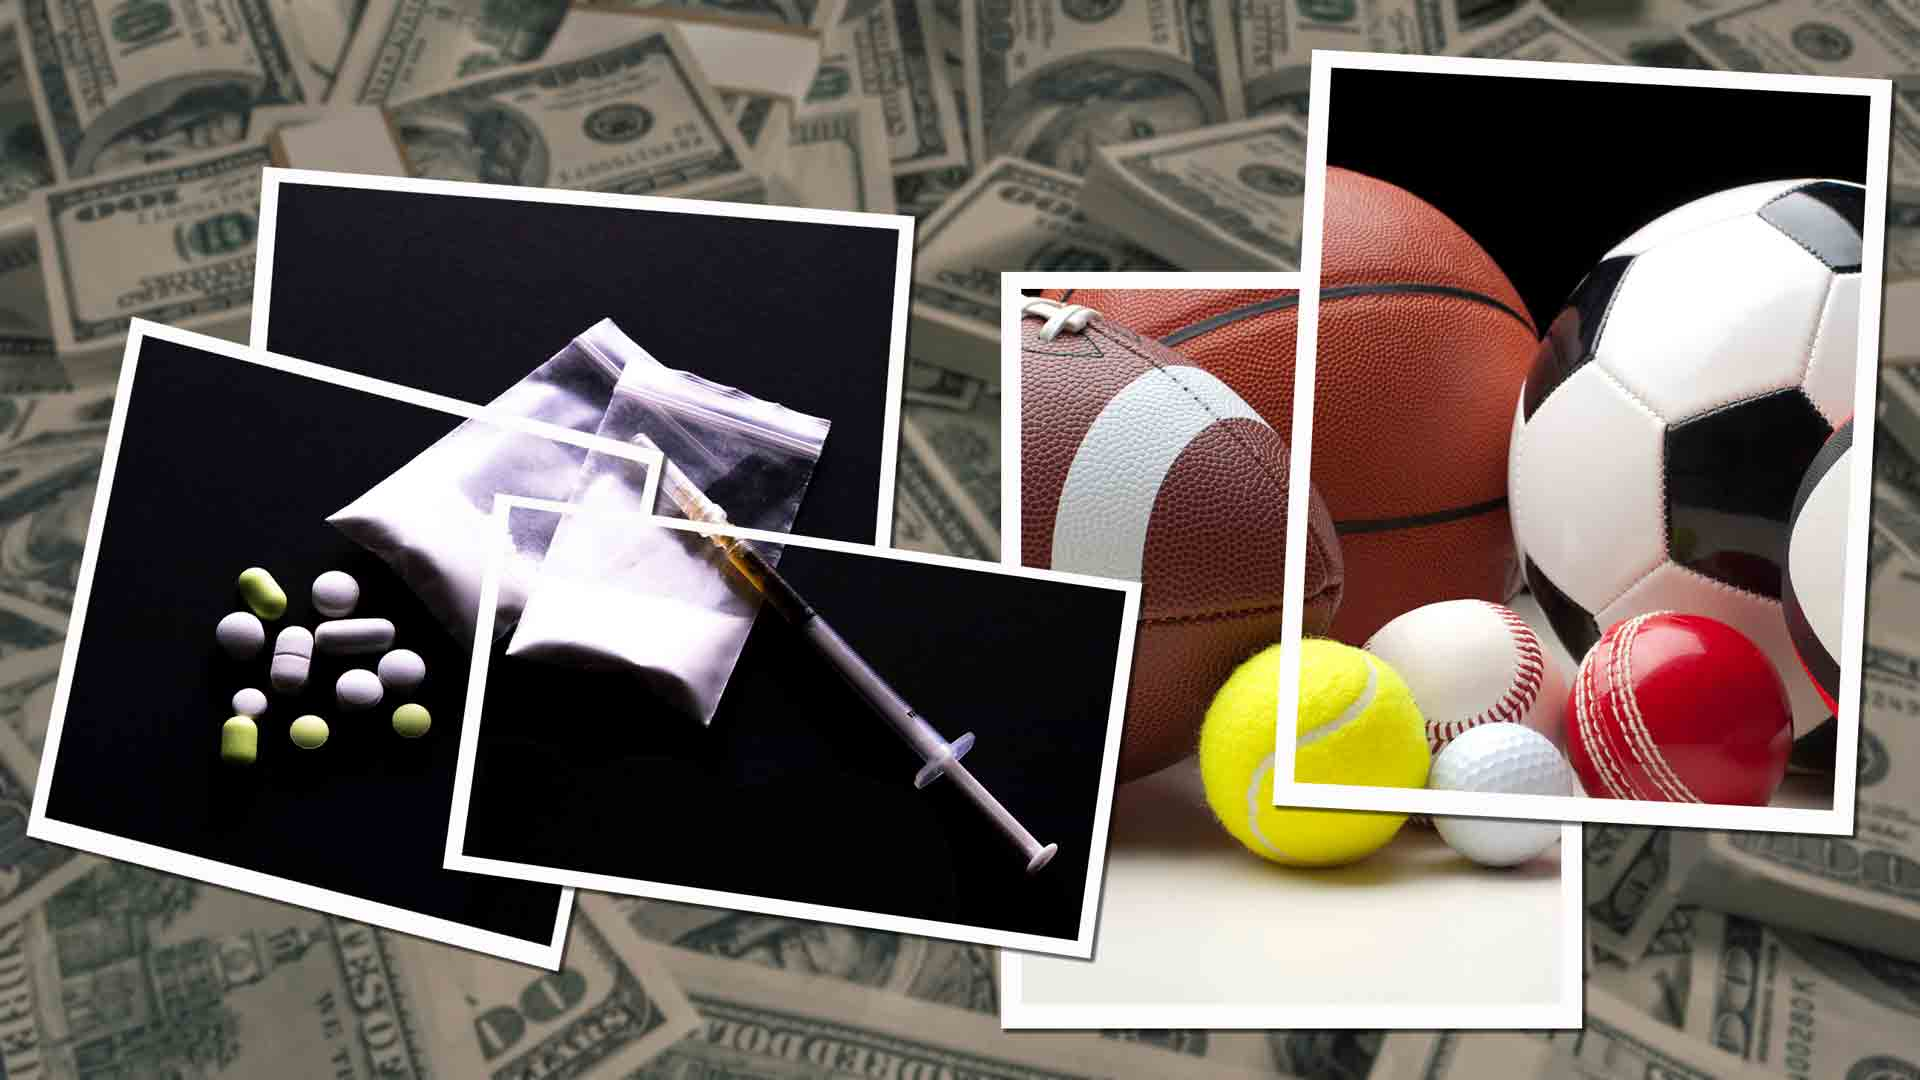 Feds bust billion dollar sports betting ring bitcoinstore reddit gone